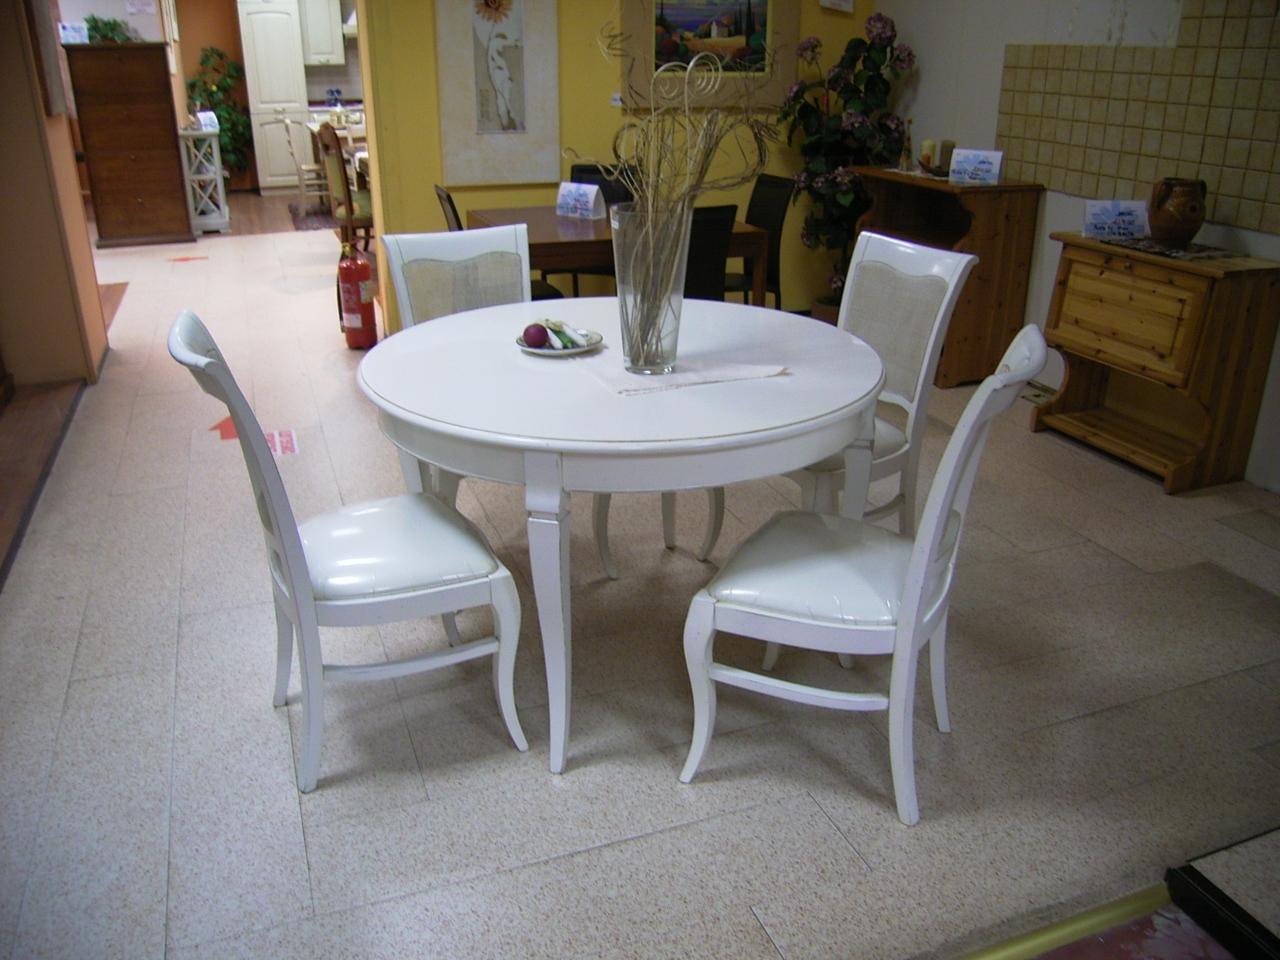 Sedie Per Tavolo Da Pranzo Antico  madgeweb.com idee di interior design